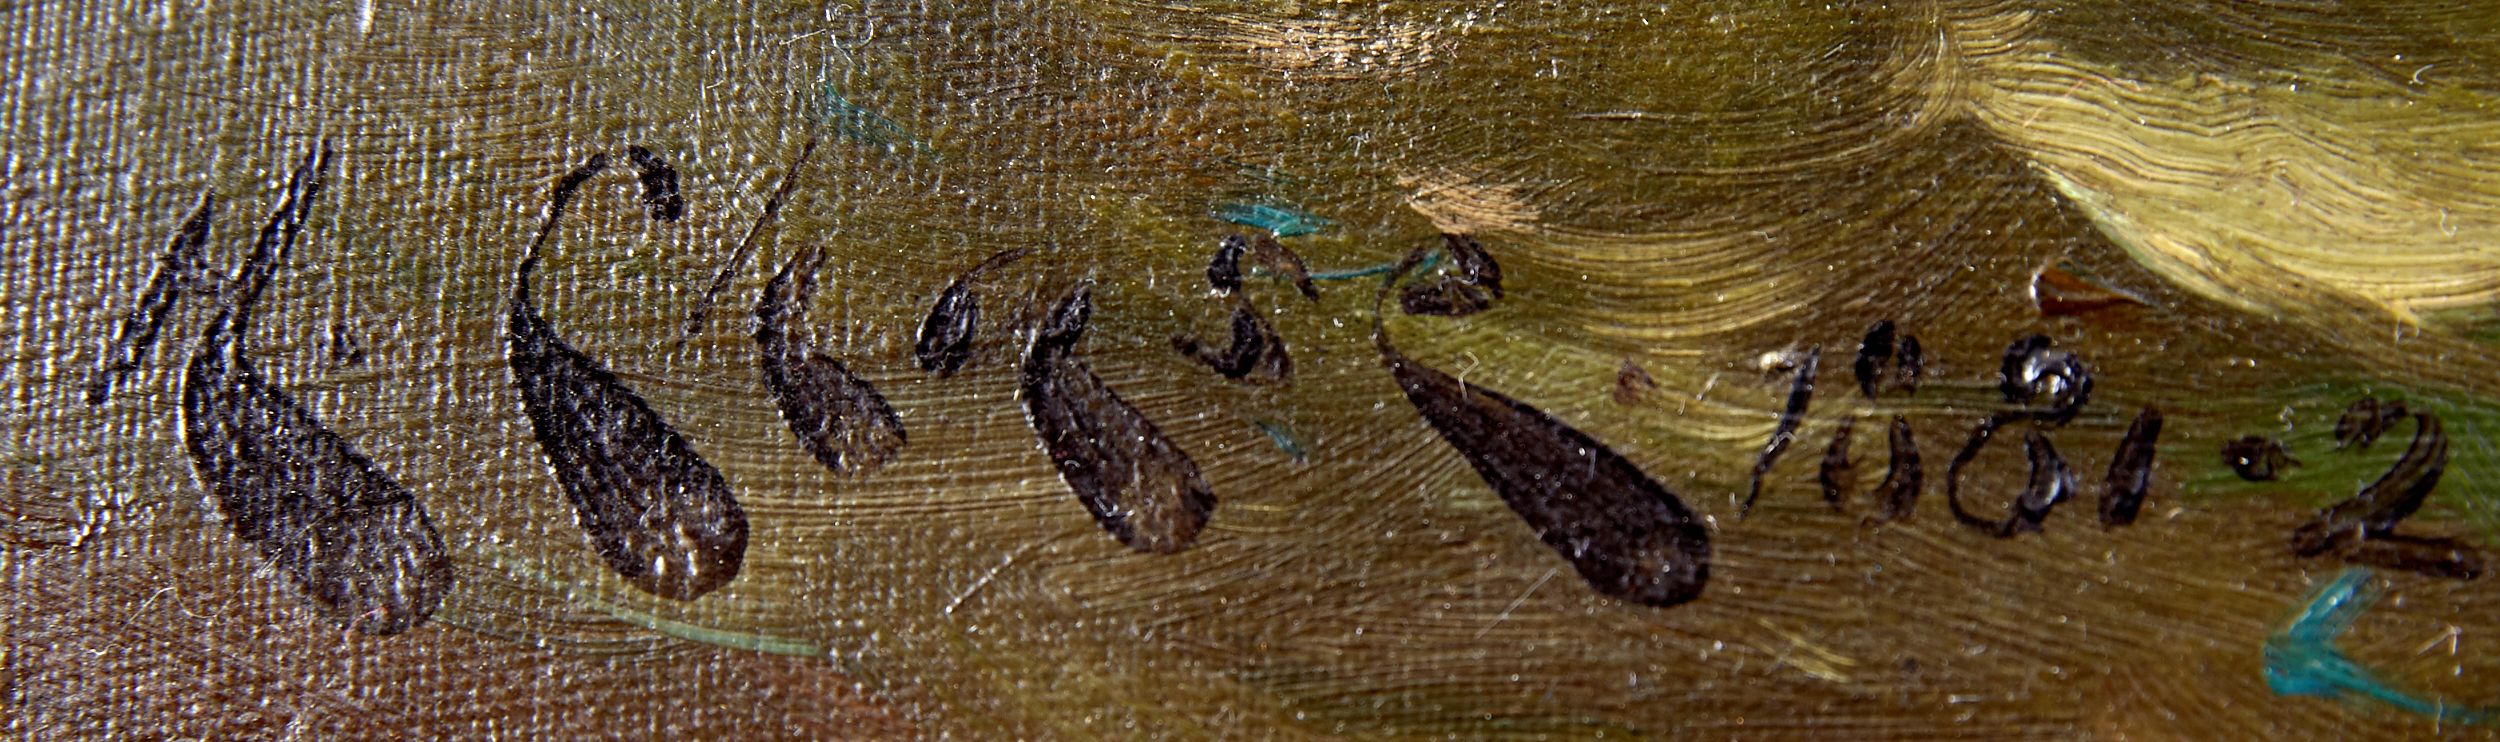 Lot 23 - Harry (Henry) Chase Marine Painting